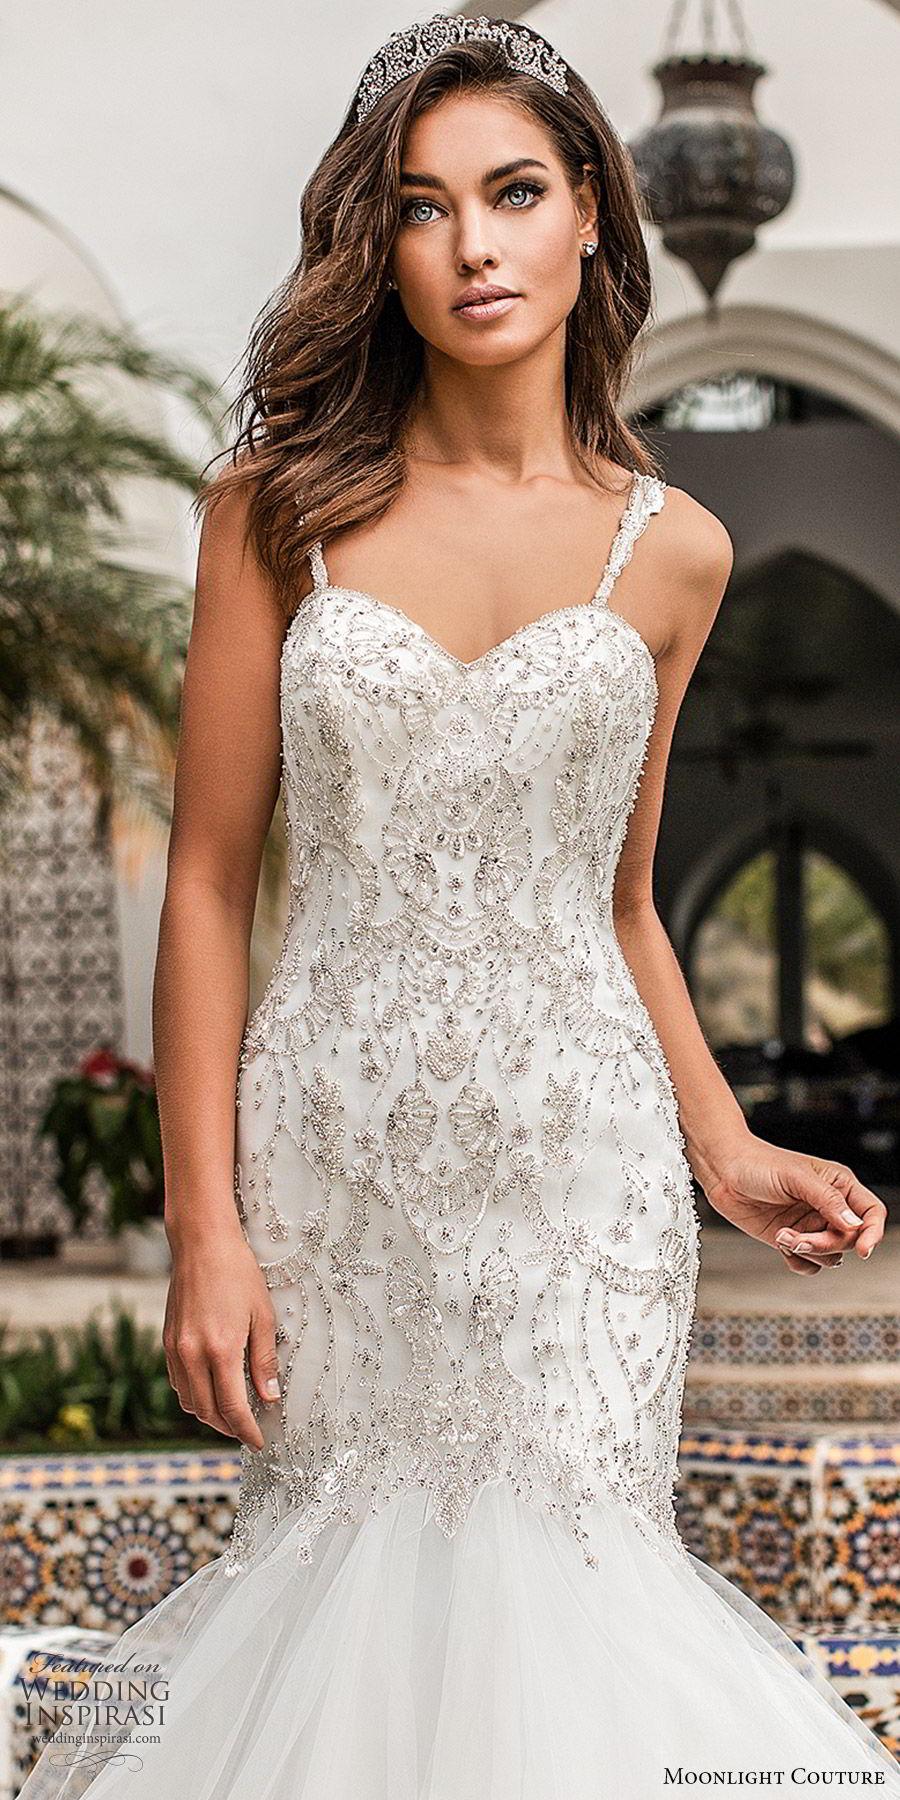 moonlight couture fall 2019 bridal sleeveless beaded sleeves sweetheart embellished bodice ruffle skirt fit flare mermaid wedding dress (11) glitzy elegant romantic chapel train zv